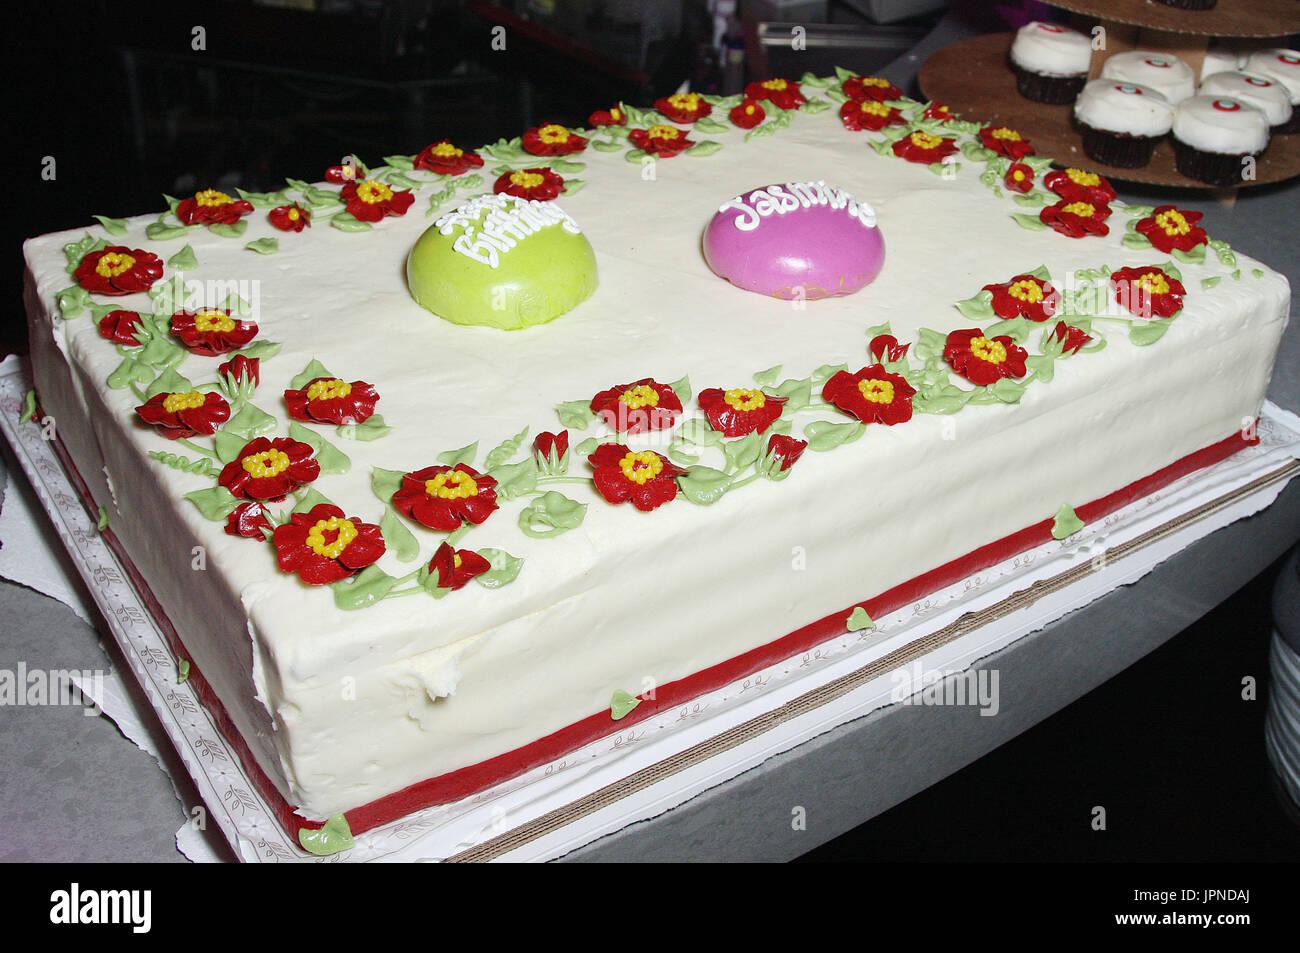 Swell Jasmine Villegas Birthday Cake At The 18Th Birthday Party Of Funny Birthday Cards Online Alyptdamsfinfo